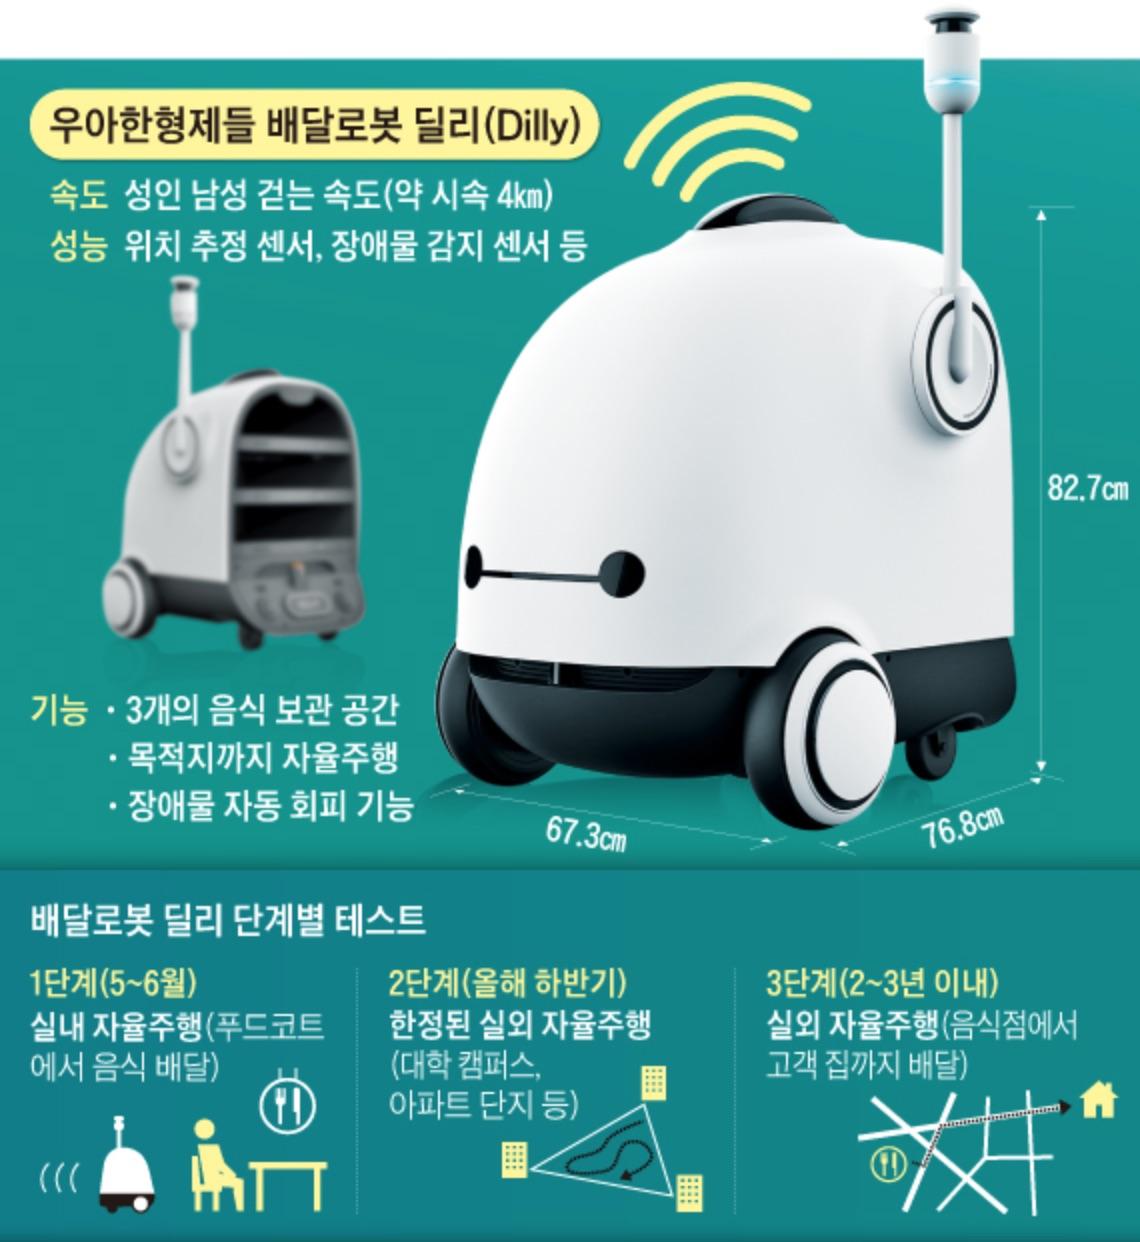 baemin robot